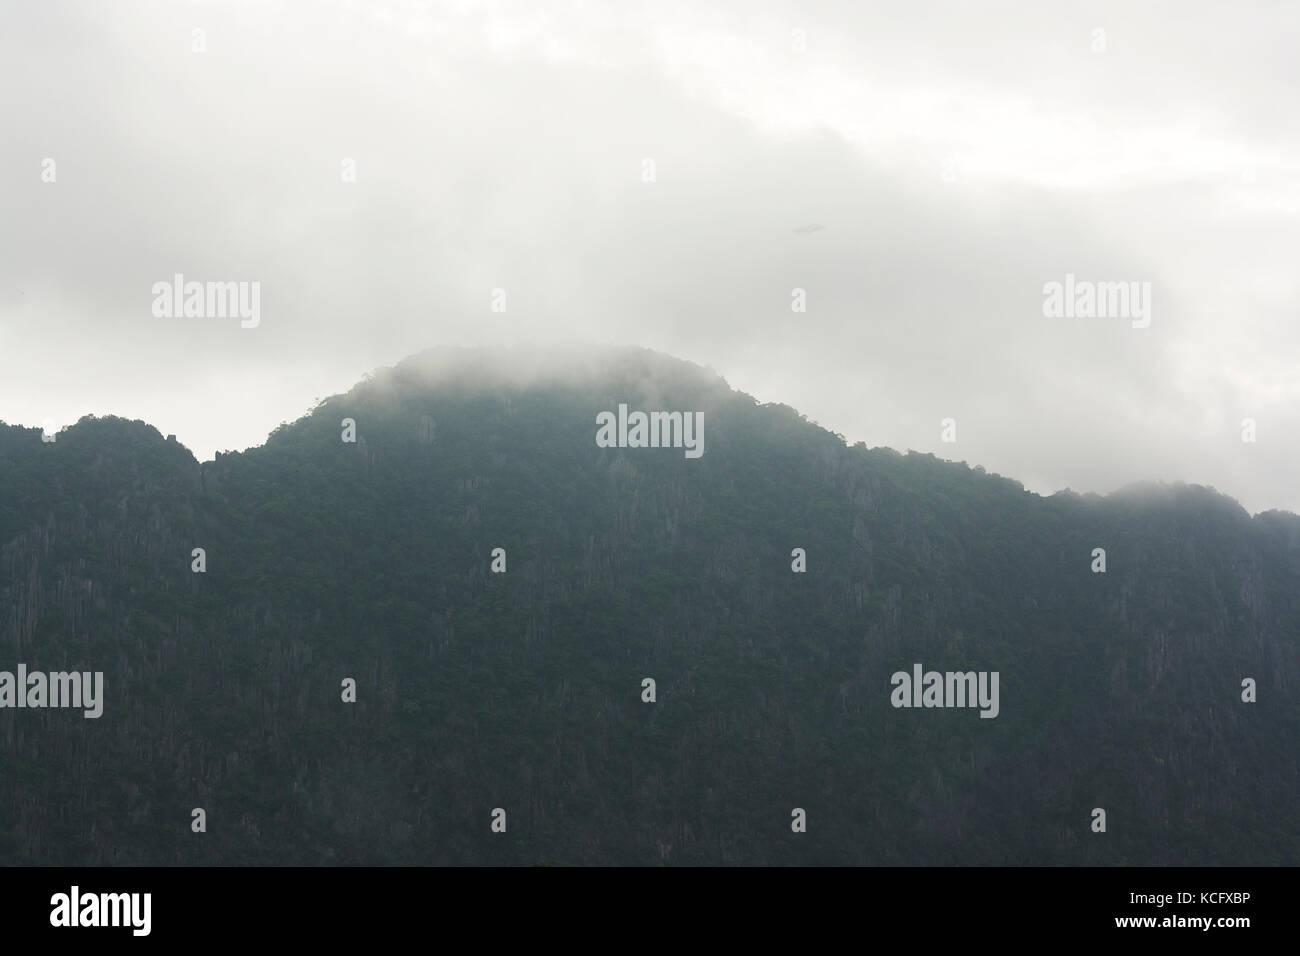 rain cloud over mountain - Stock Image